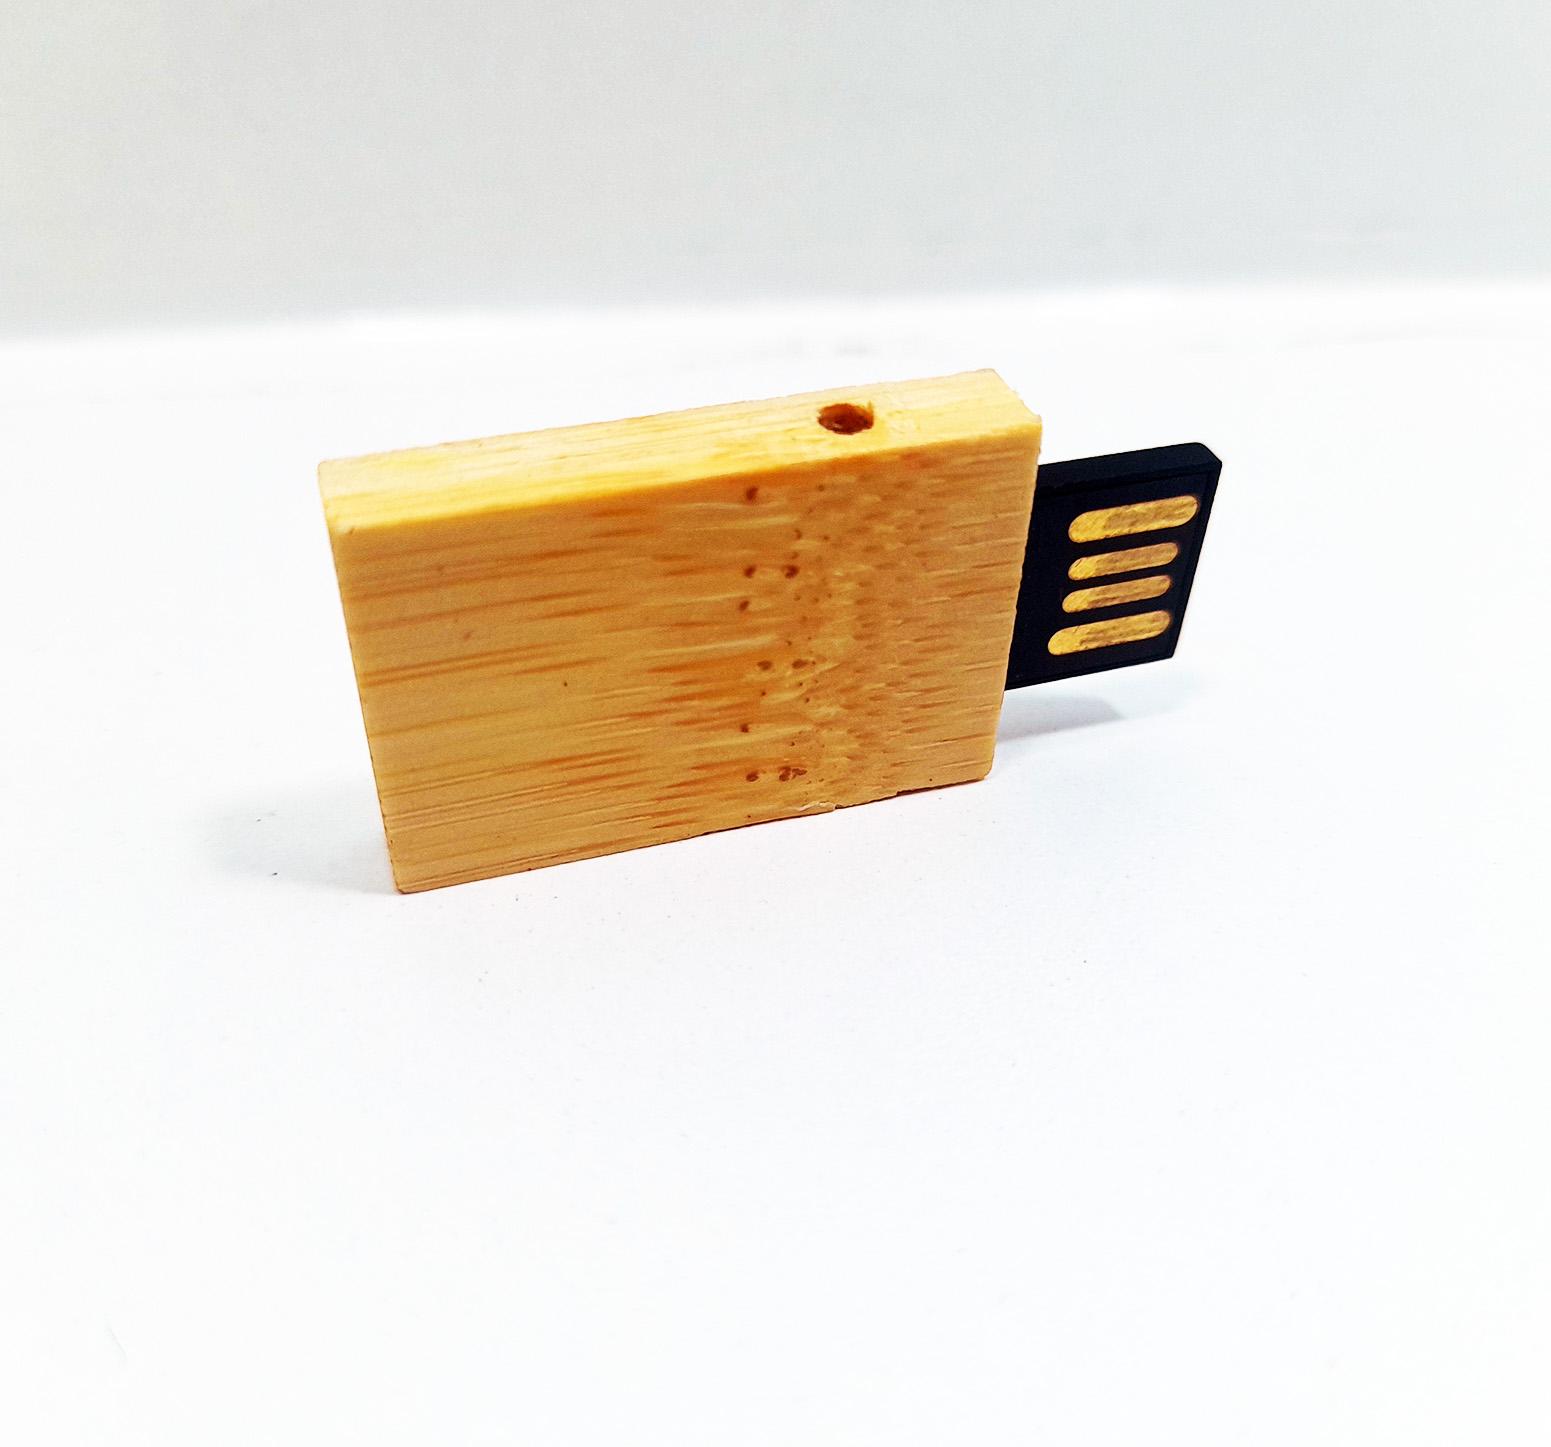 Linha rECOdrive - Pendrives Ecologicos Sustentáveis - Fit Card 8 GB e 16 GB - Exclusivo